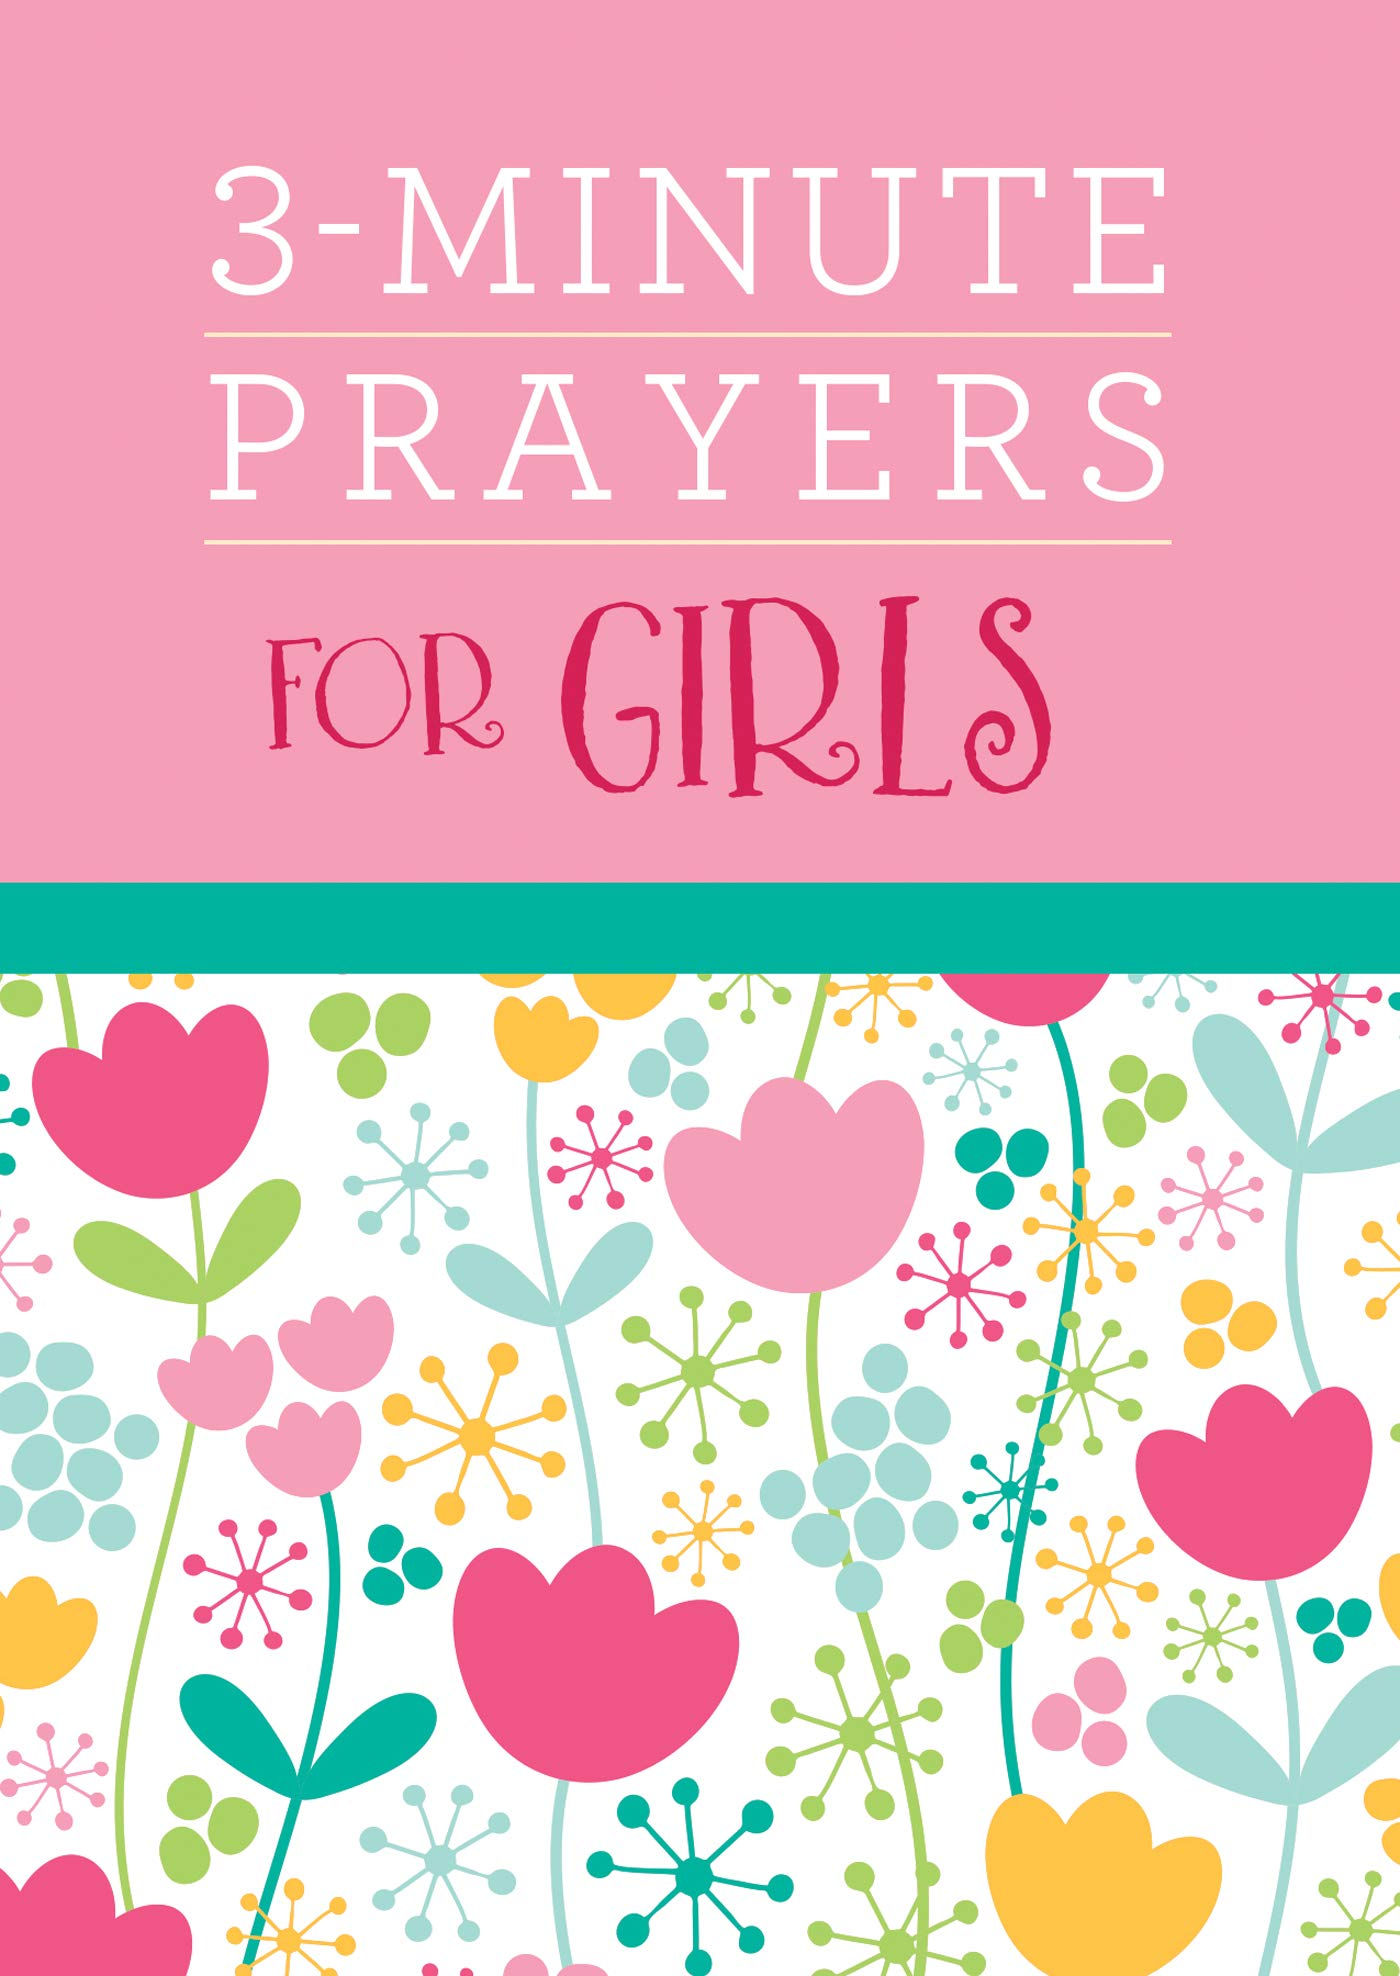 3-Minute Prayers for Girls (3-Minute Devotions): Margot Starbuck:  9781683228851: Amazon.com: Books